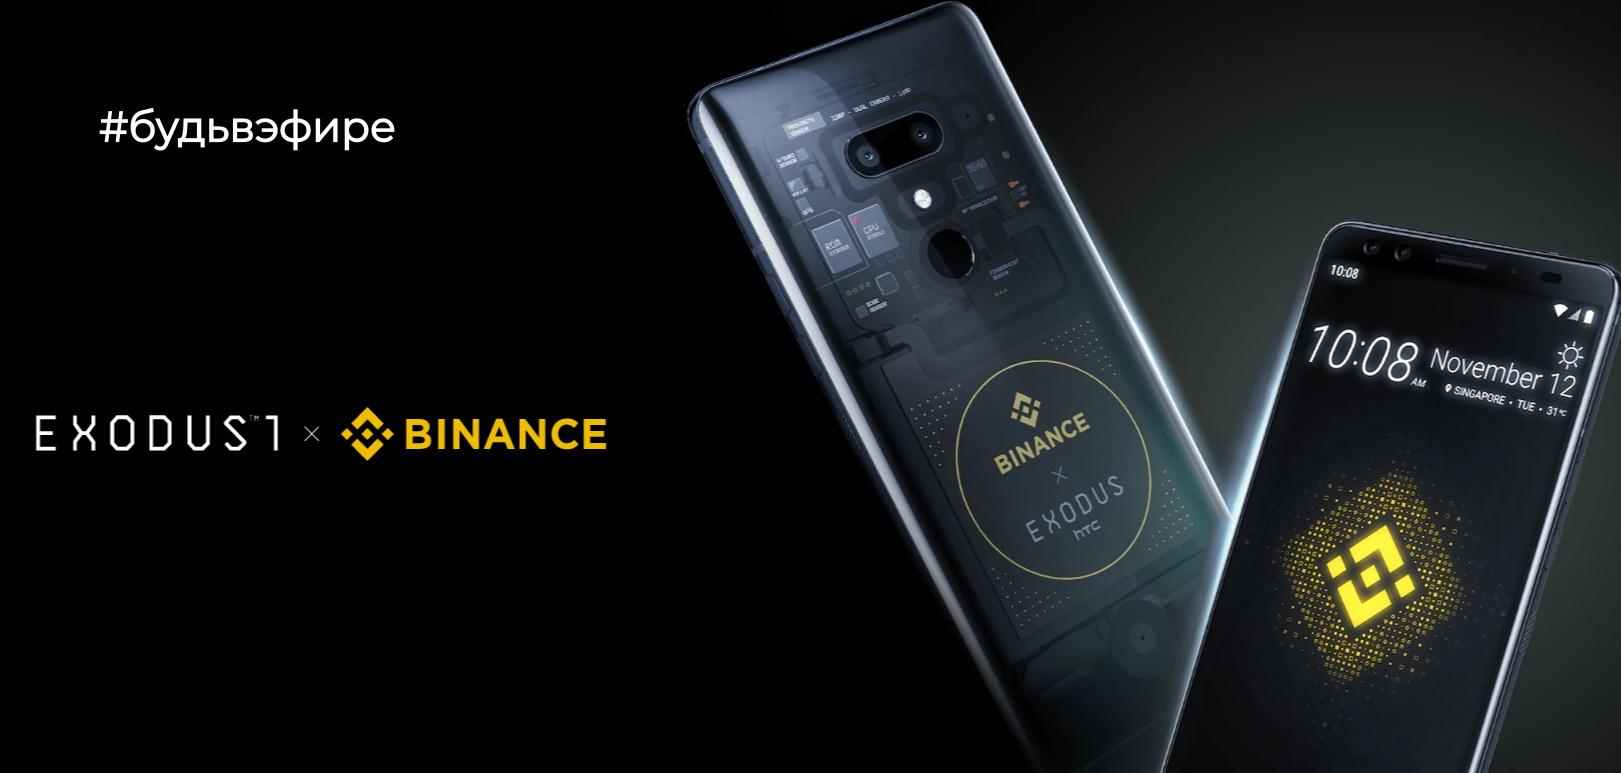 Стартовали продажи Смартфона HTC Exodus 1-Binance